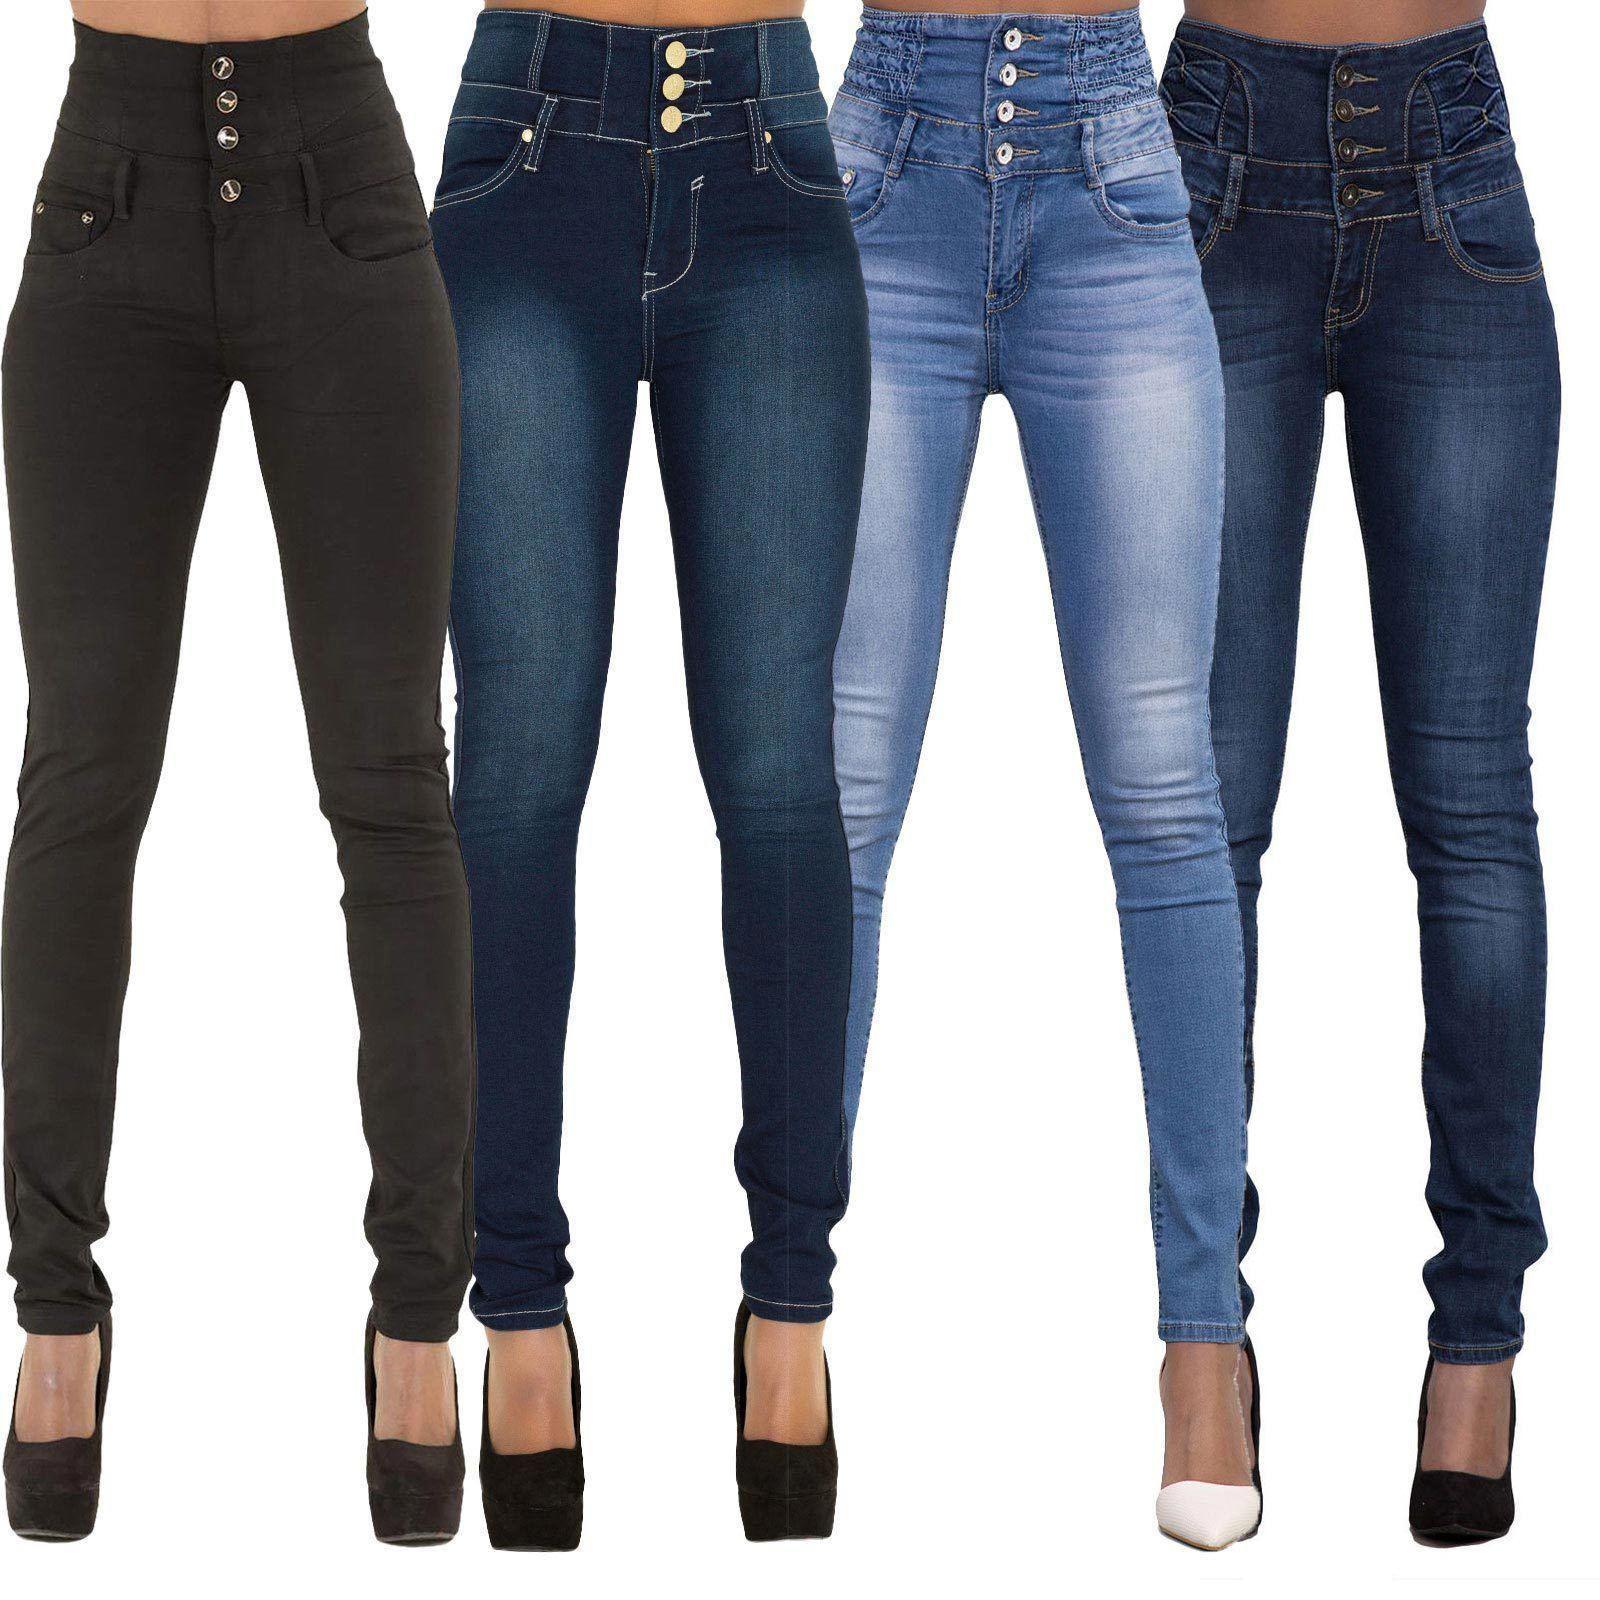 91737a2dad4f3 2019 Hot Women Ladies Jeans Women Denim Skinny Jeggings Jeans Pants High  Waist Stretch Jeans Slim Pencil Women Trousers From Jiehan_shop, $18.1 |  DHgate.Com